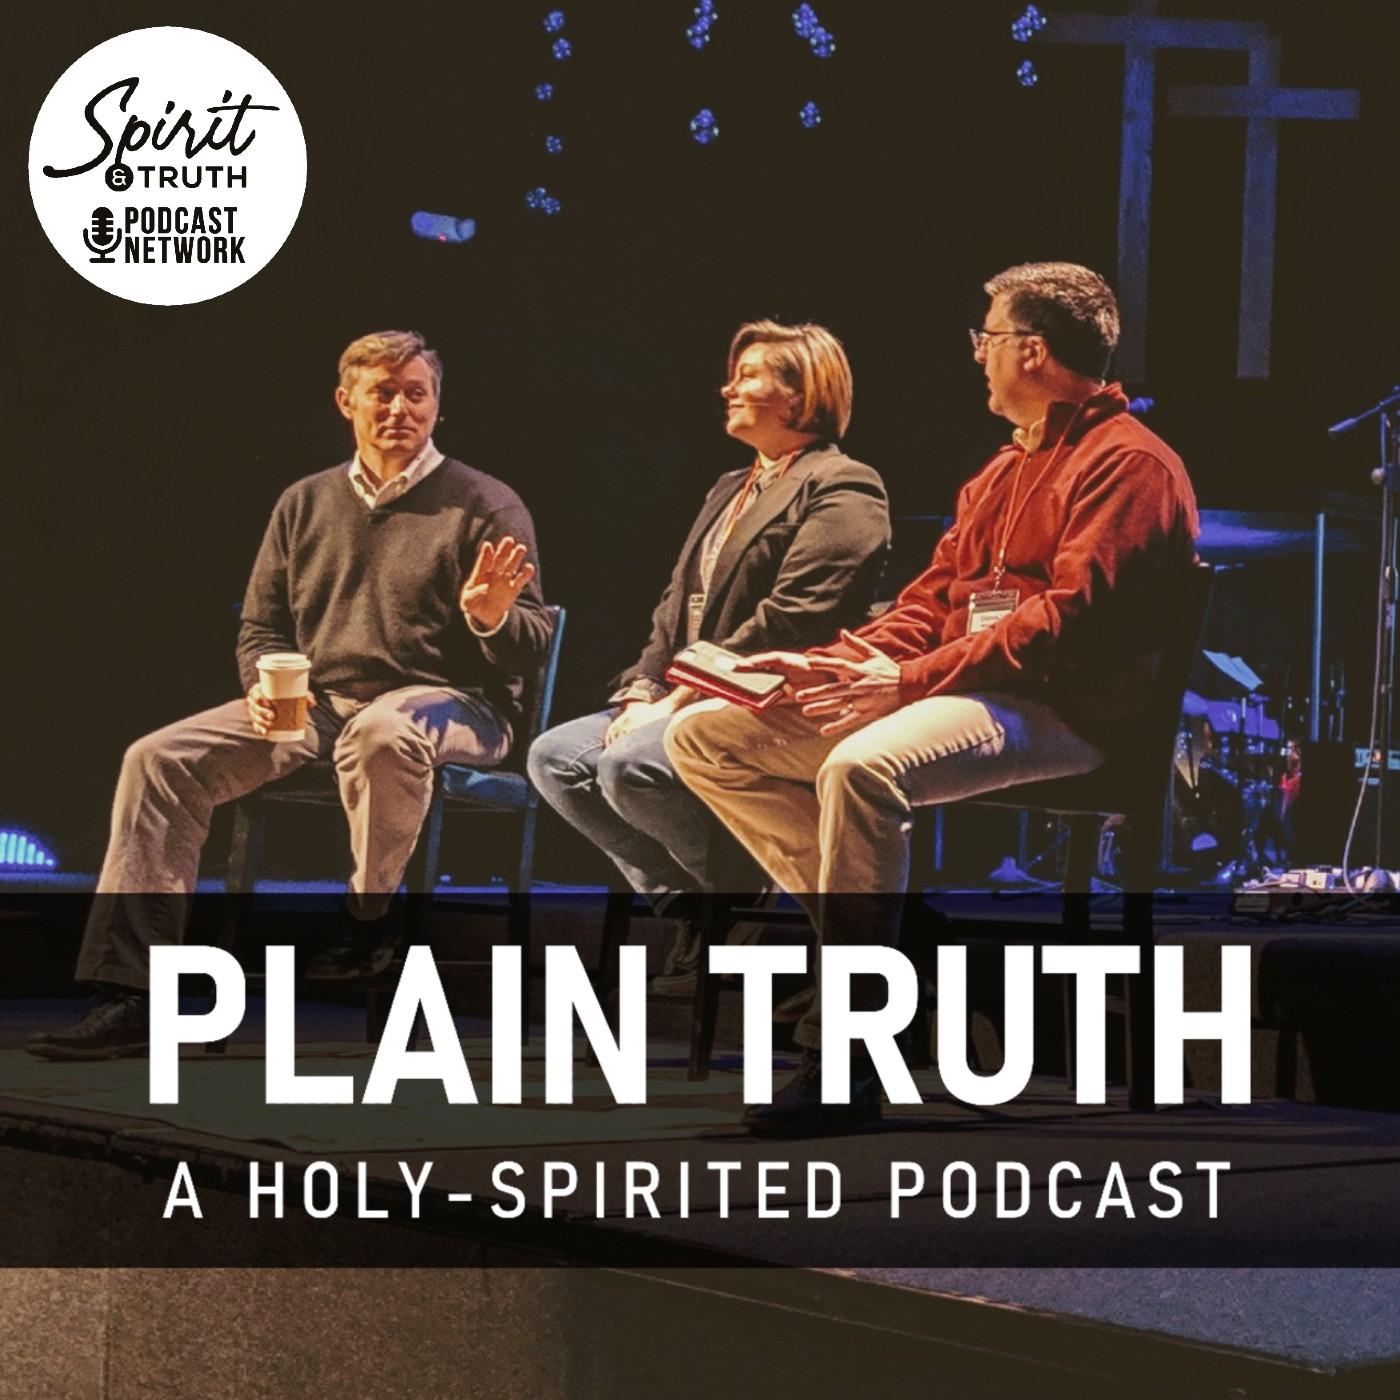 Plain Truth: A Holy-Spirited Podcast show art